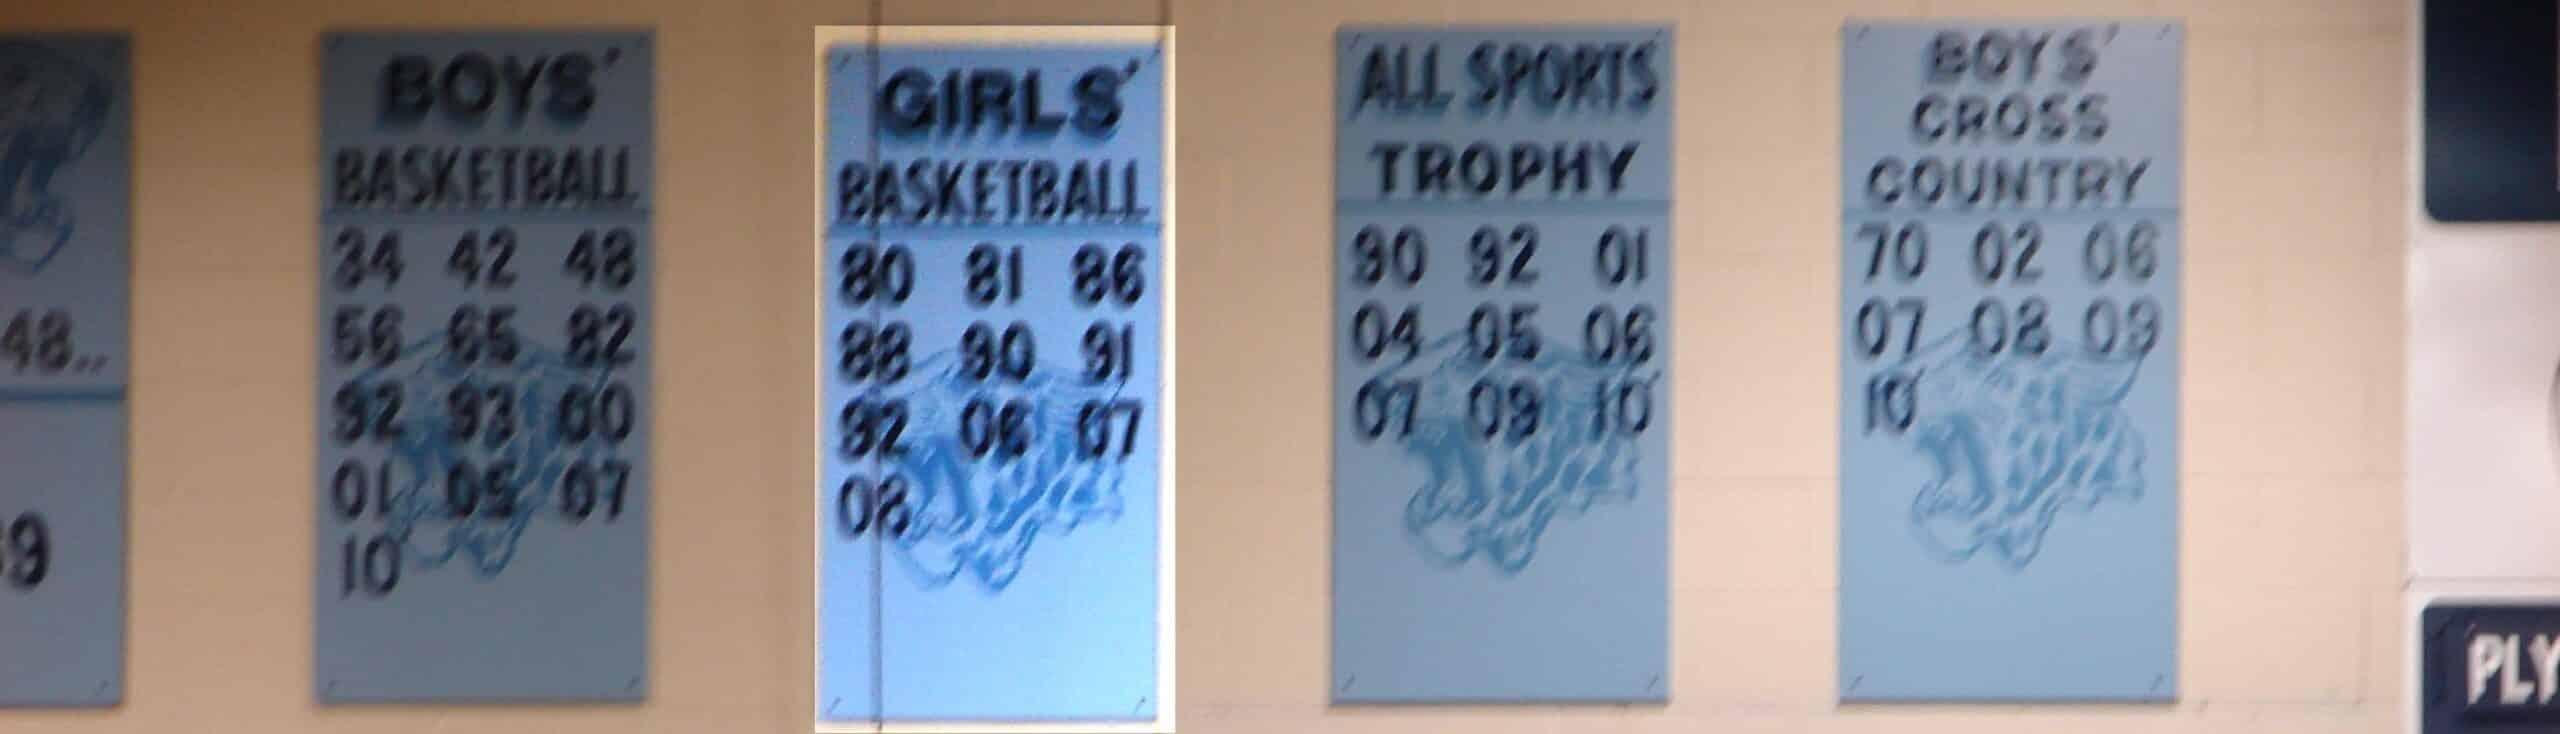 Louisville Lady Leopards Basketball 2007-08